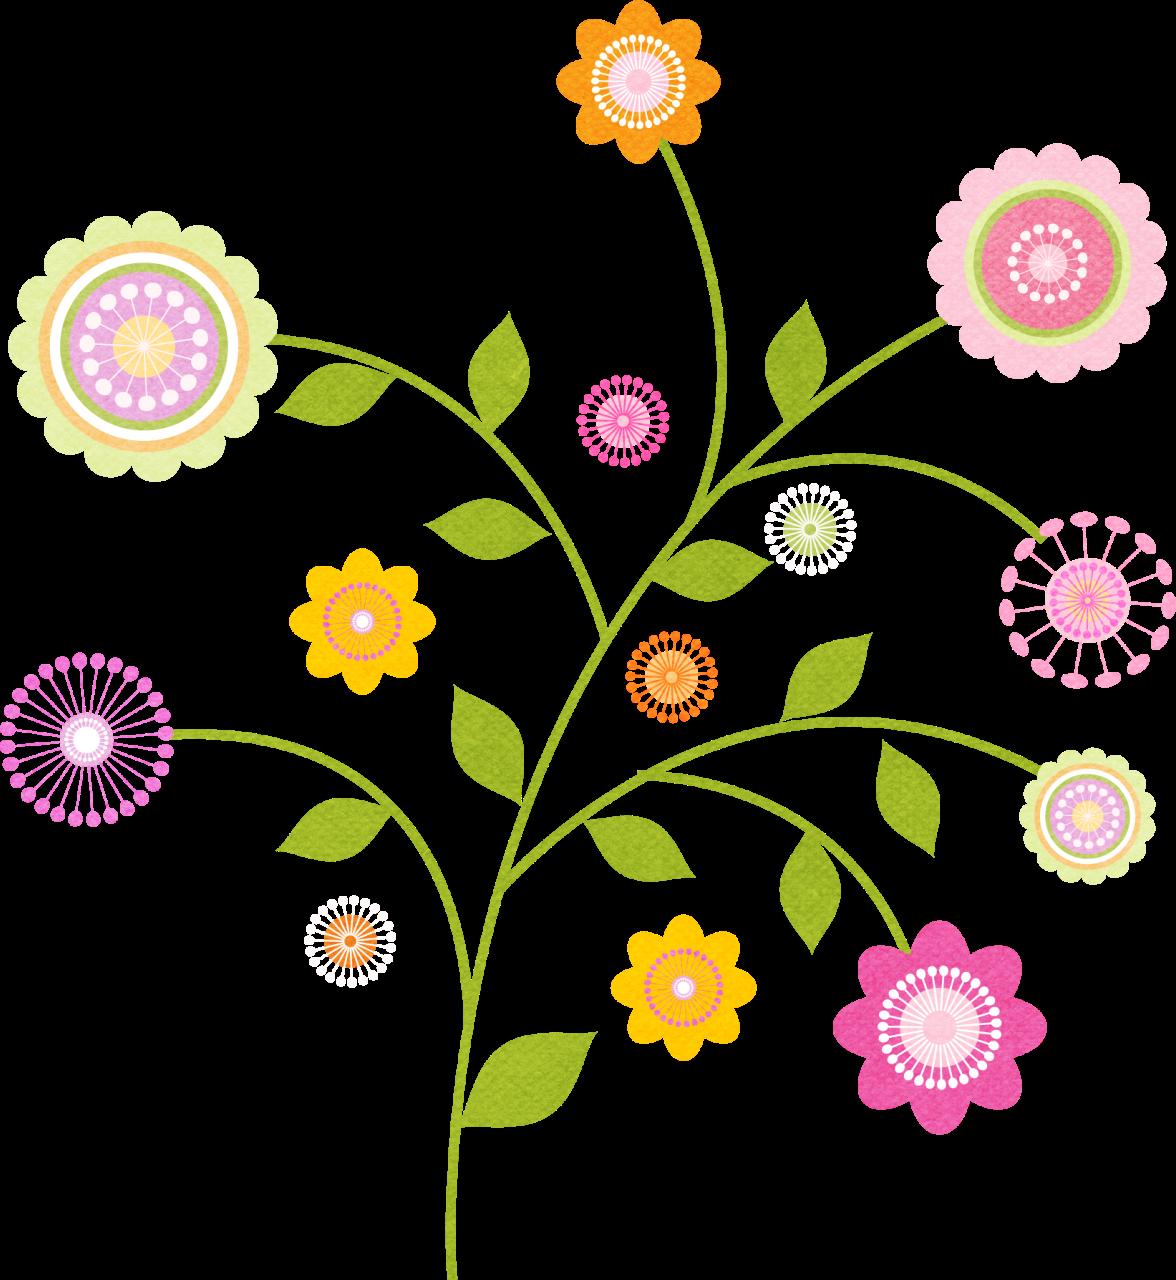 stock Sprinkles vector seamless pattern. Sweetsprinkles png design wraps